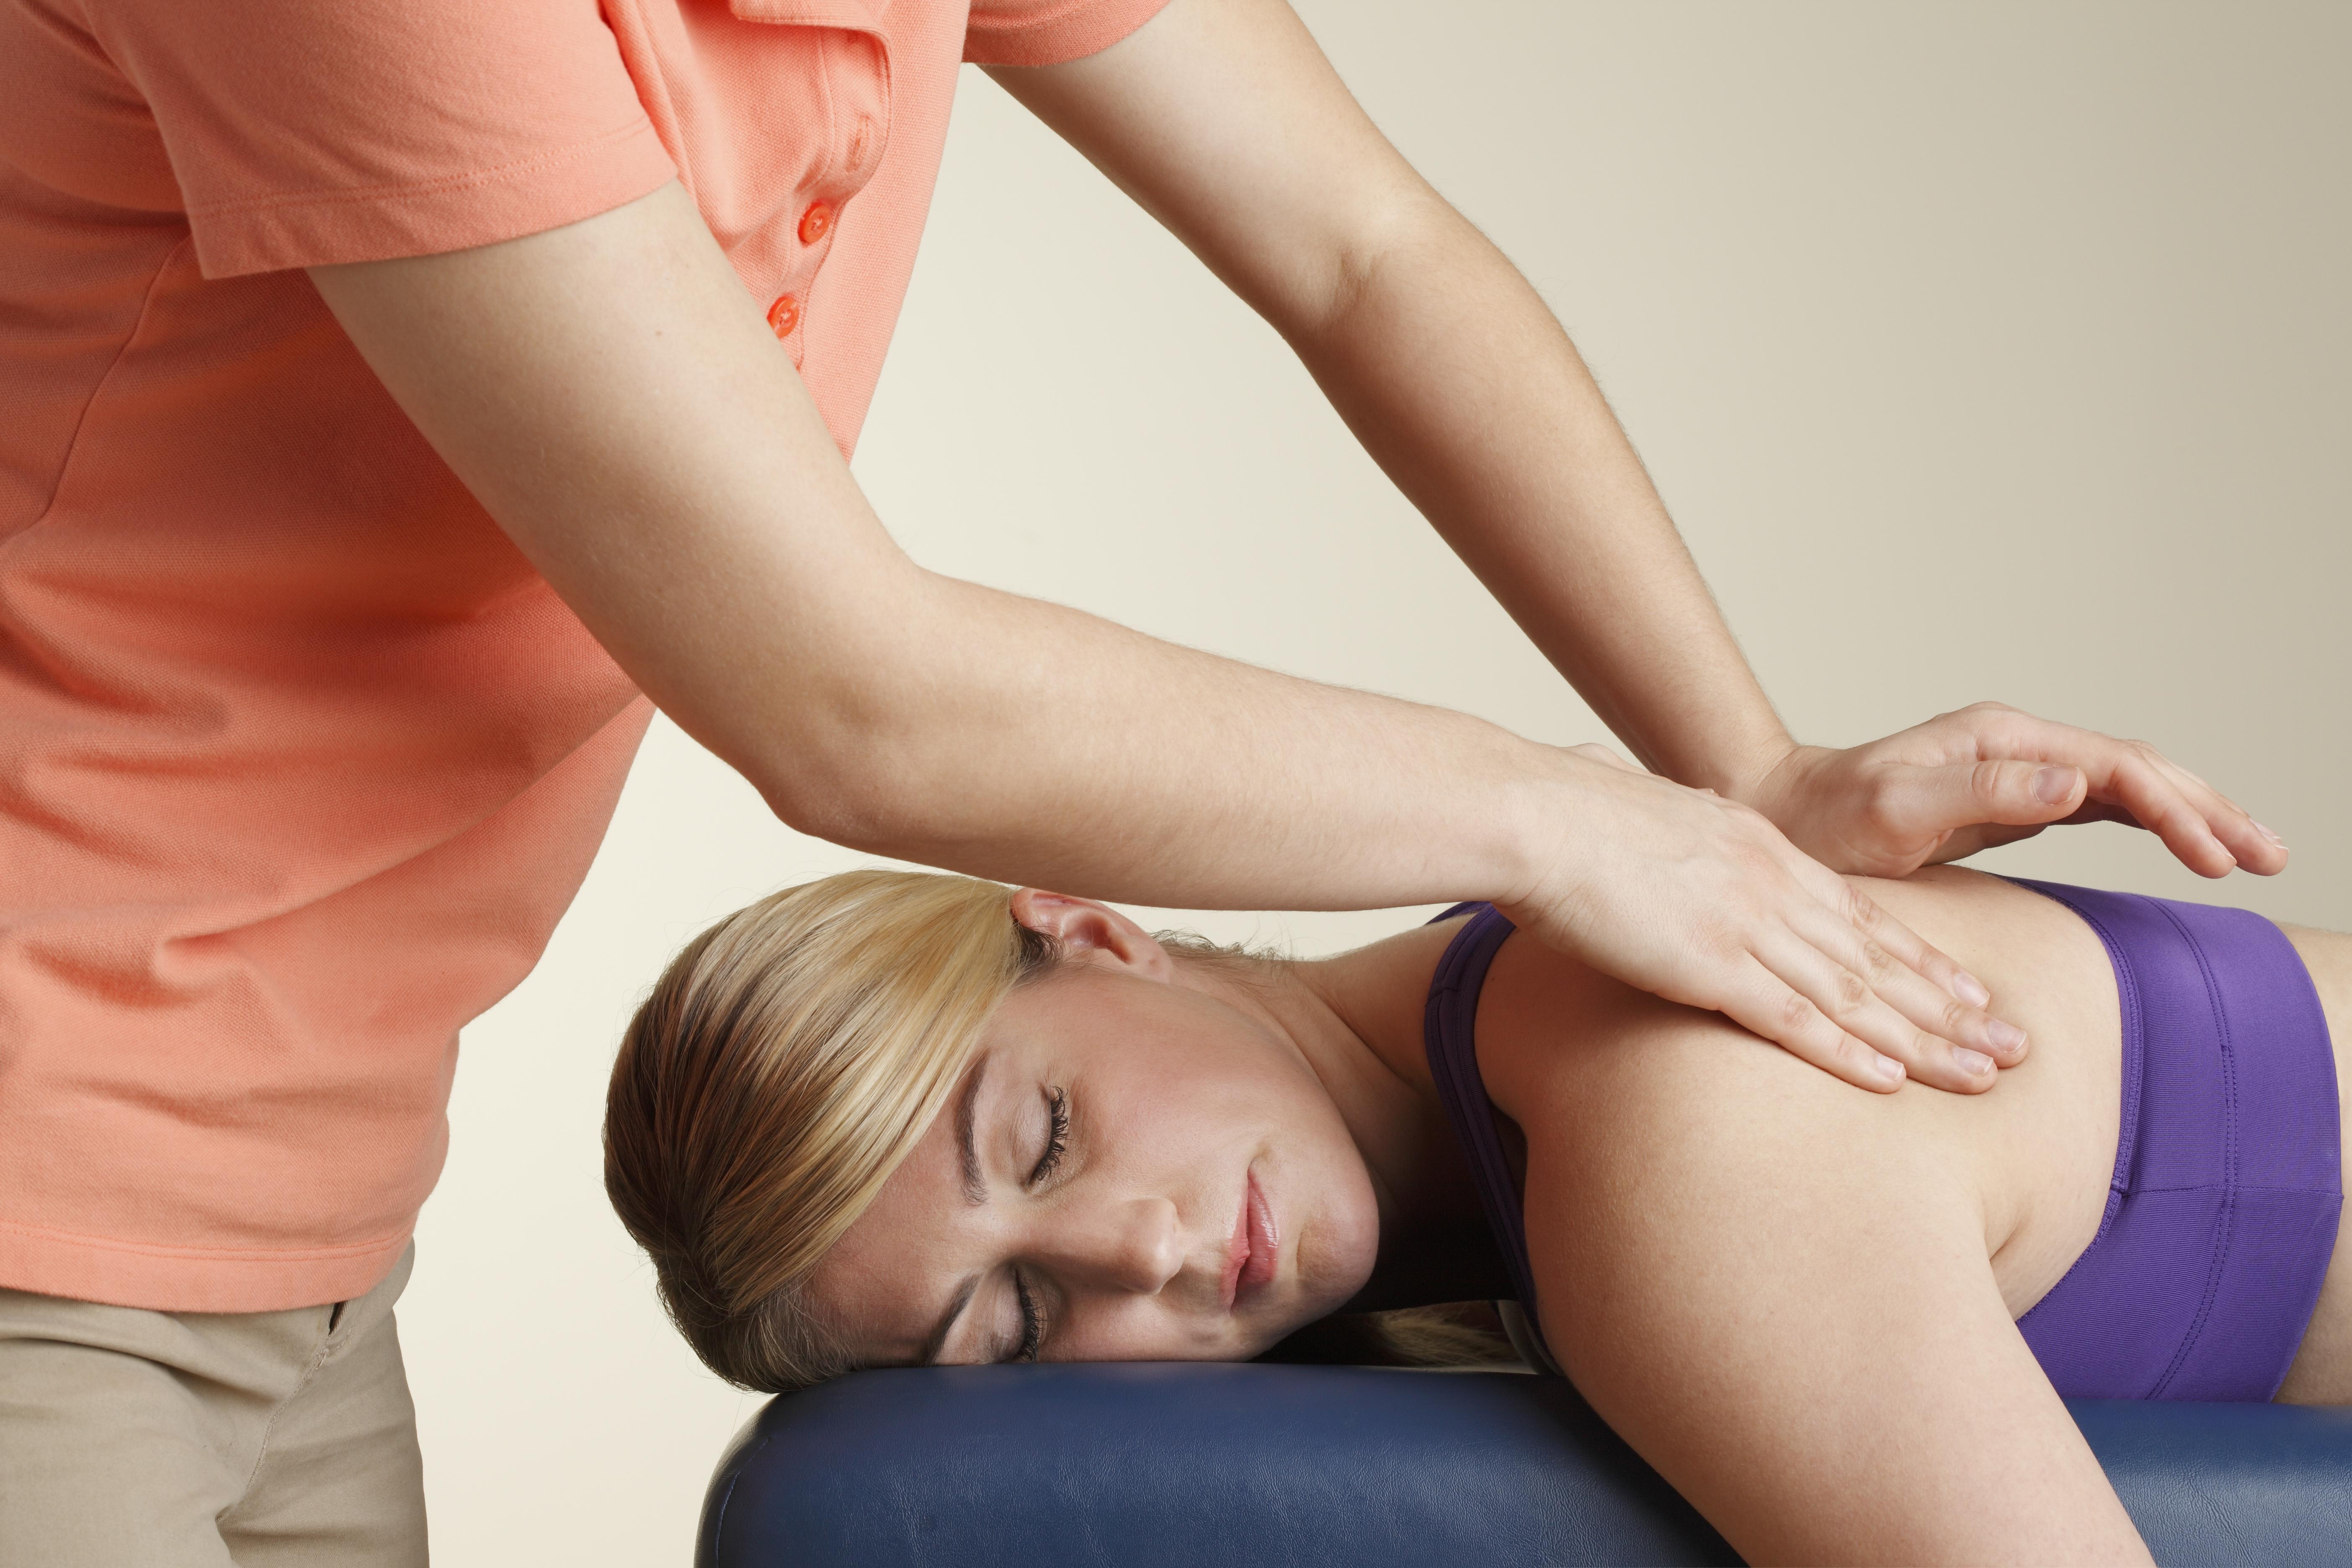 Terapia Manual Manipulativa: Servicios de Centro de Fisioterapia Diego Merchán